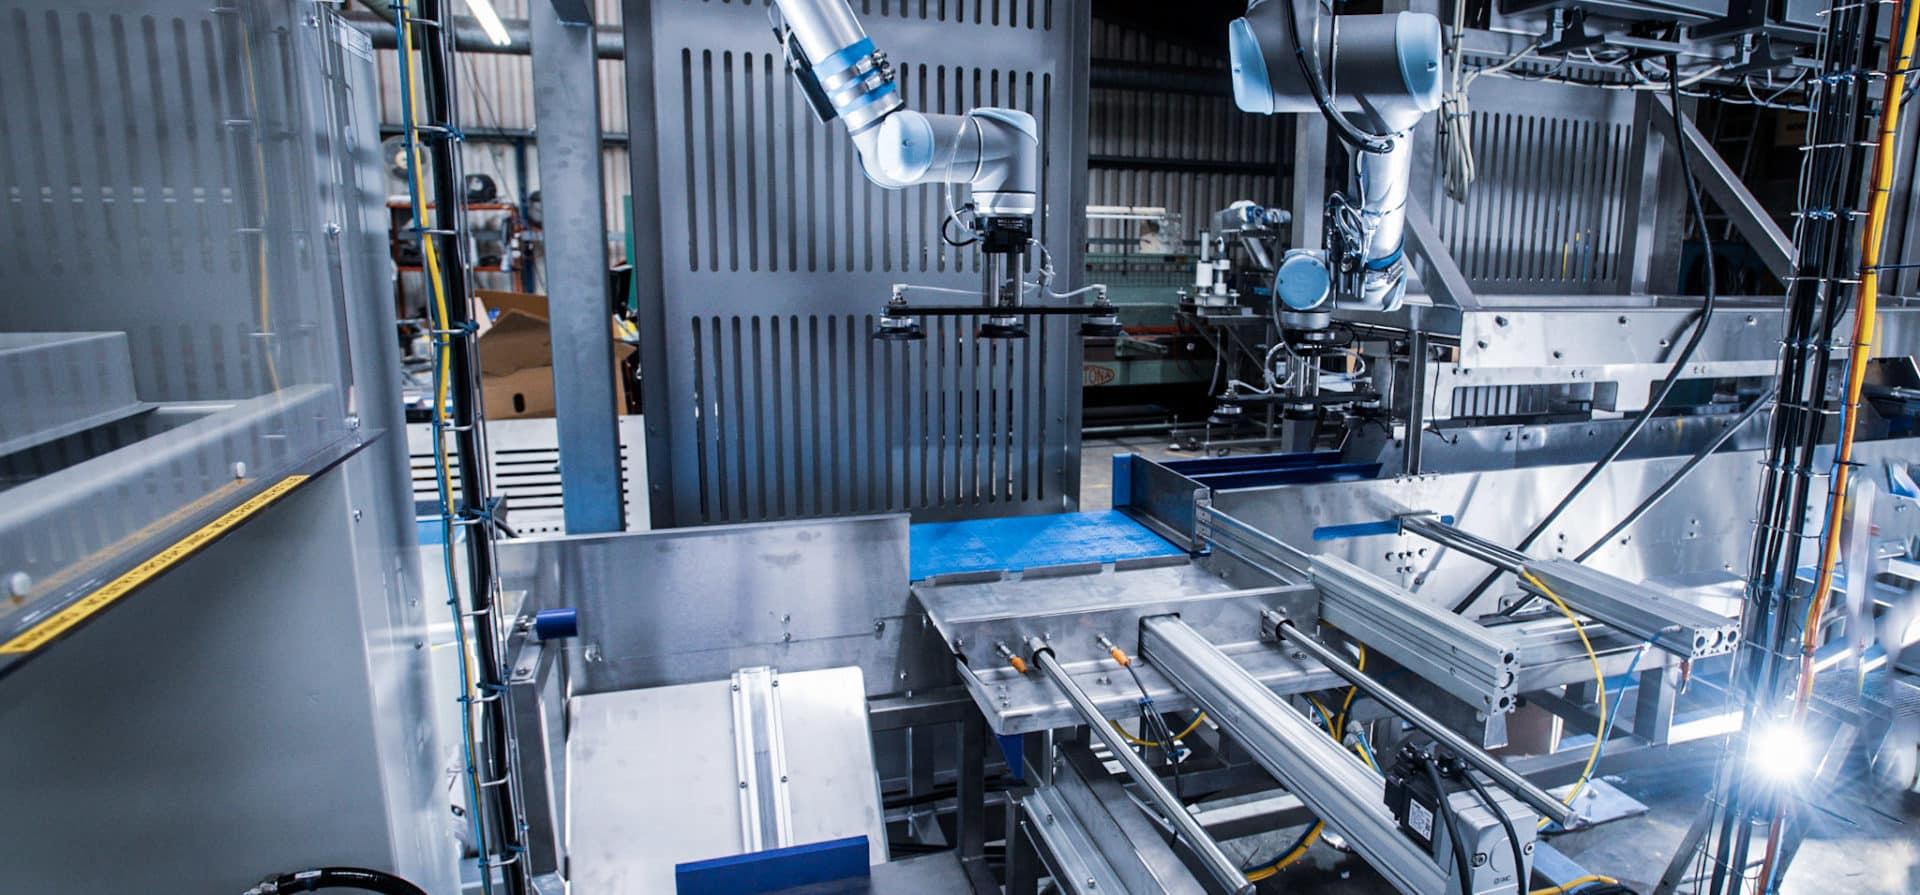 Collaborative Robots - Improve Efficiency Scroller 2 | Euroflow Automation Ltd